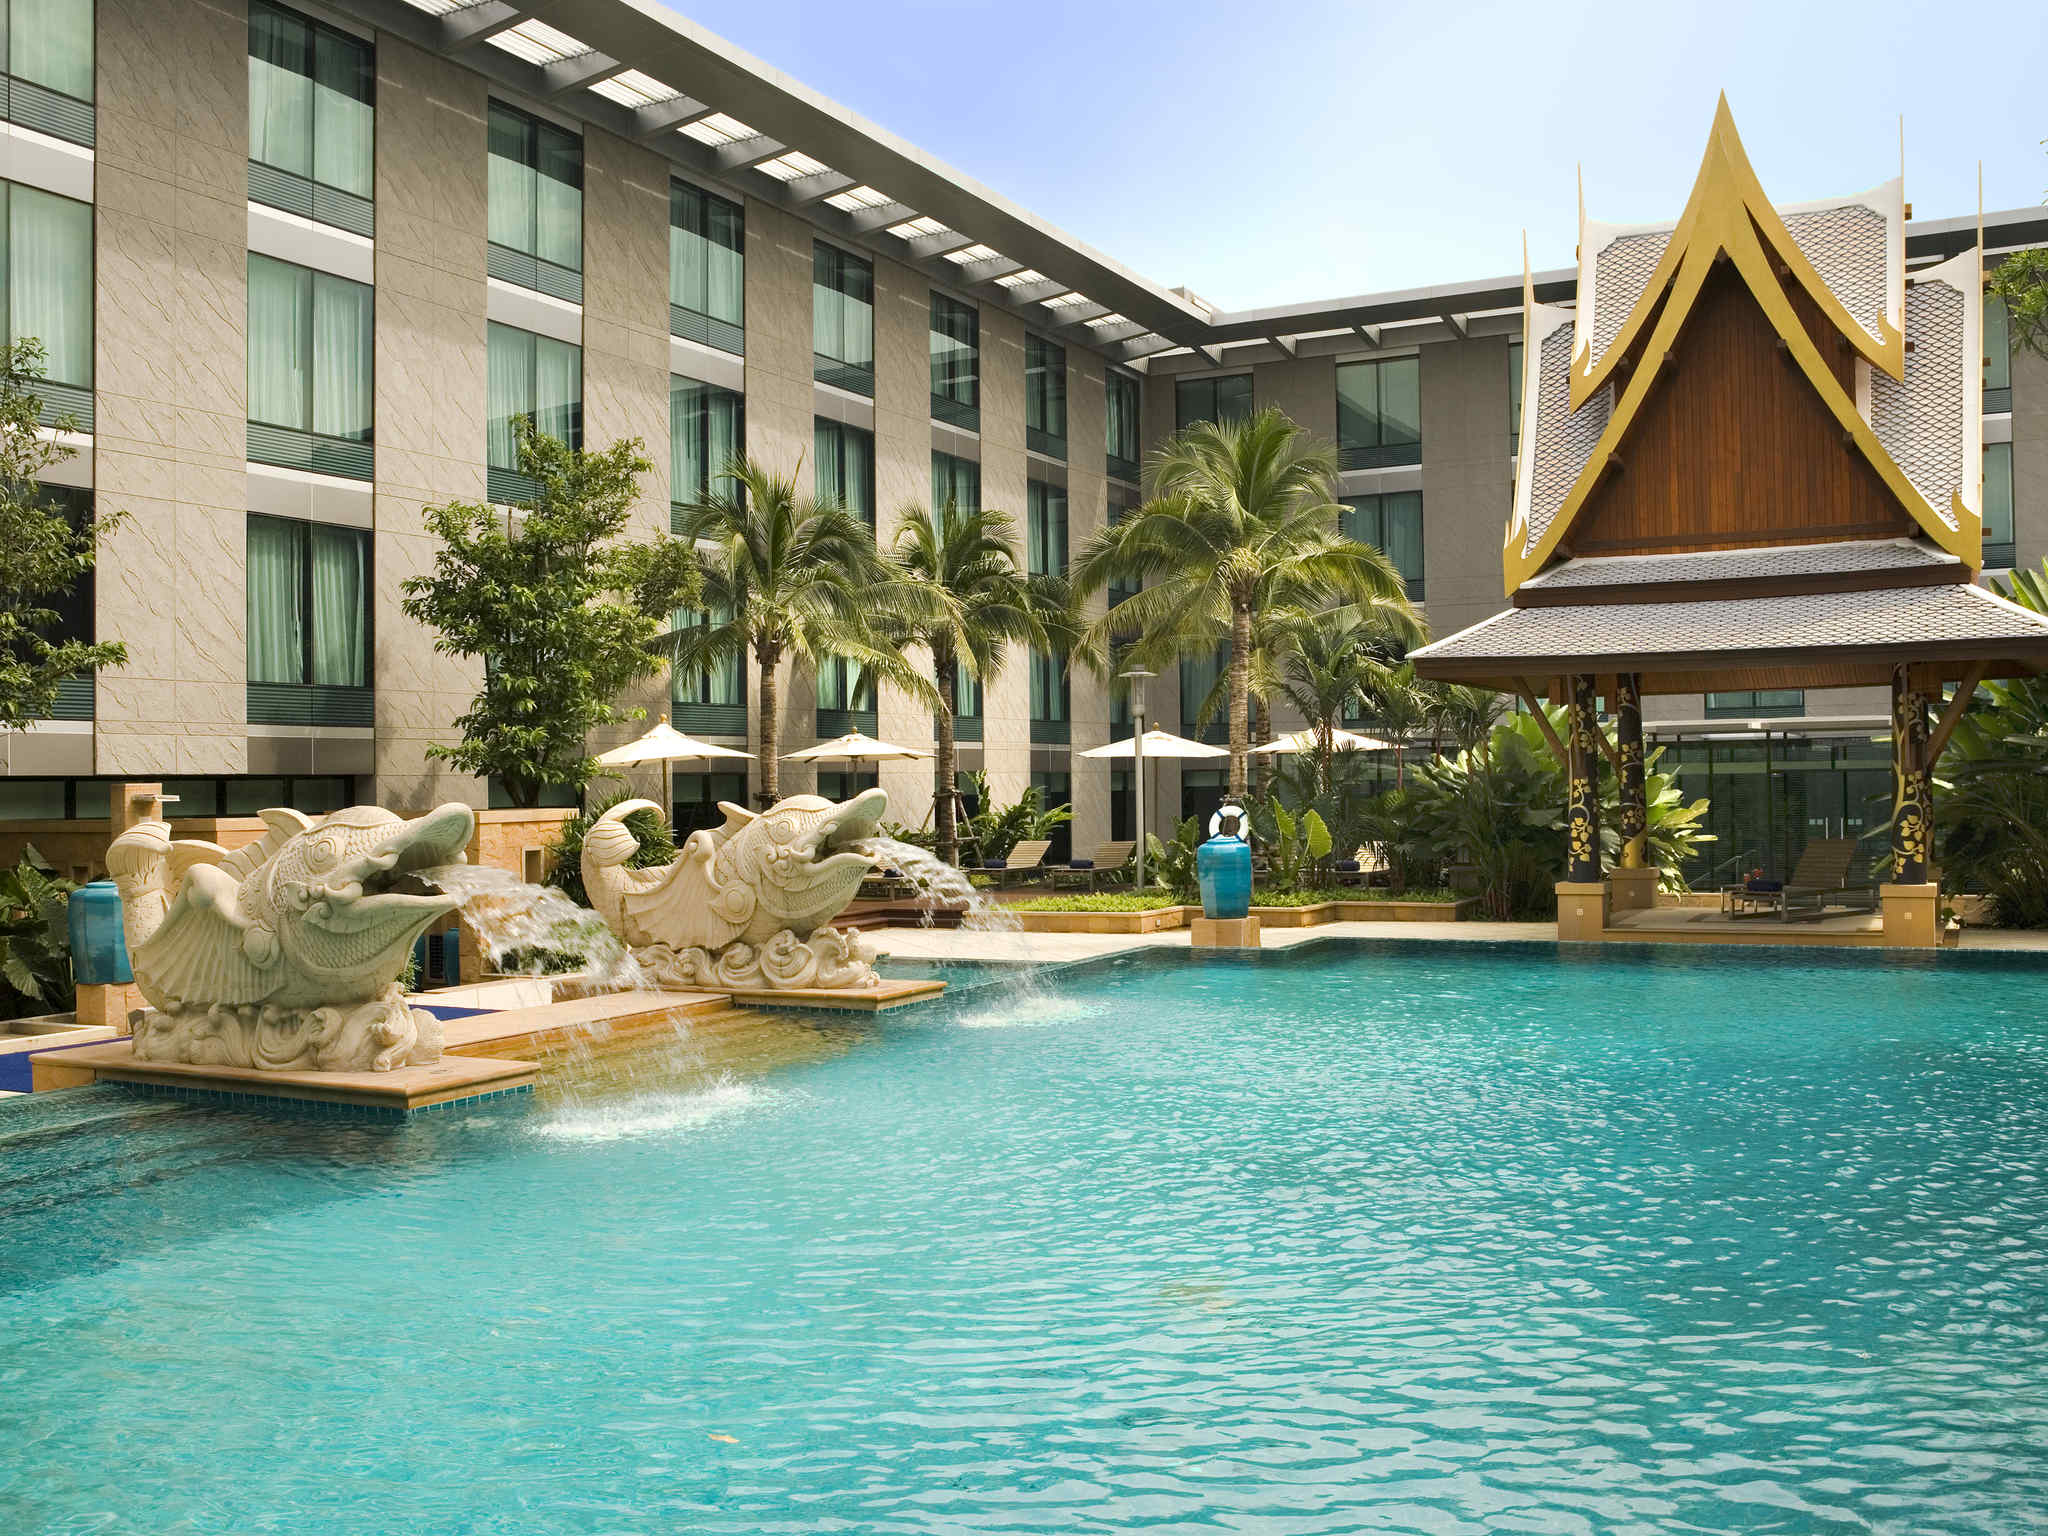 Hotel In Samut Prakarn Novotel Bangkok Suvarnabhumi Airport